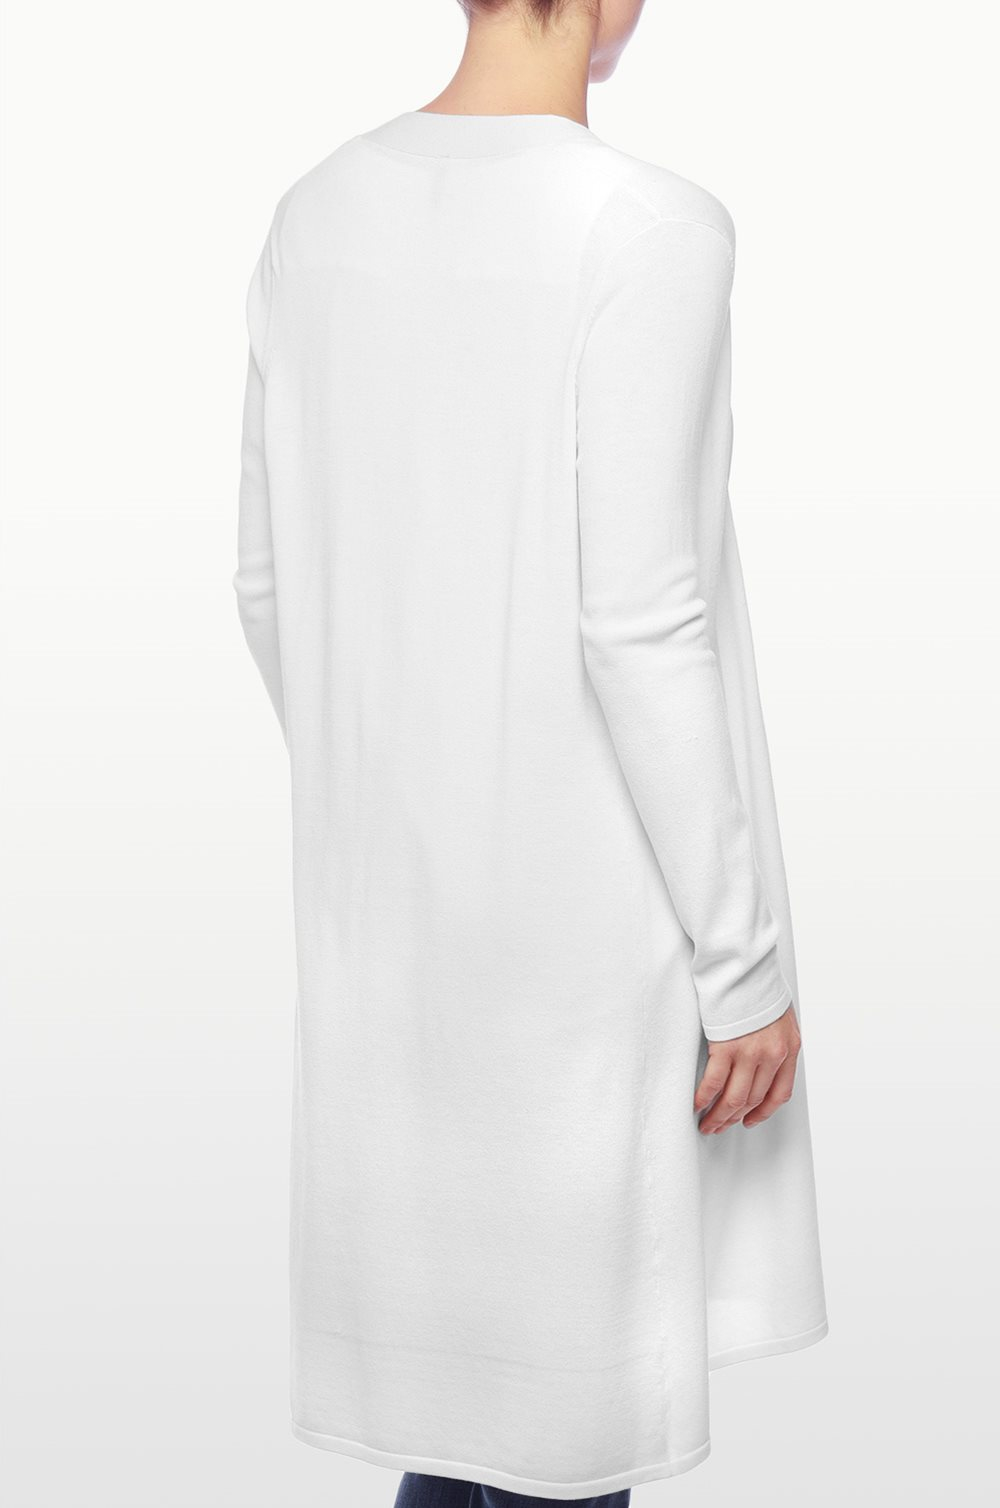 Nydj Duster Cardigan in White | Lyst